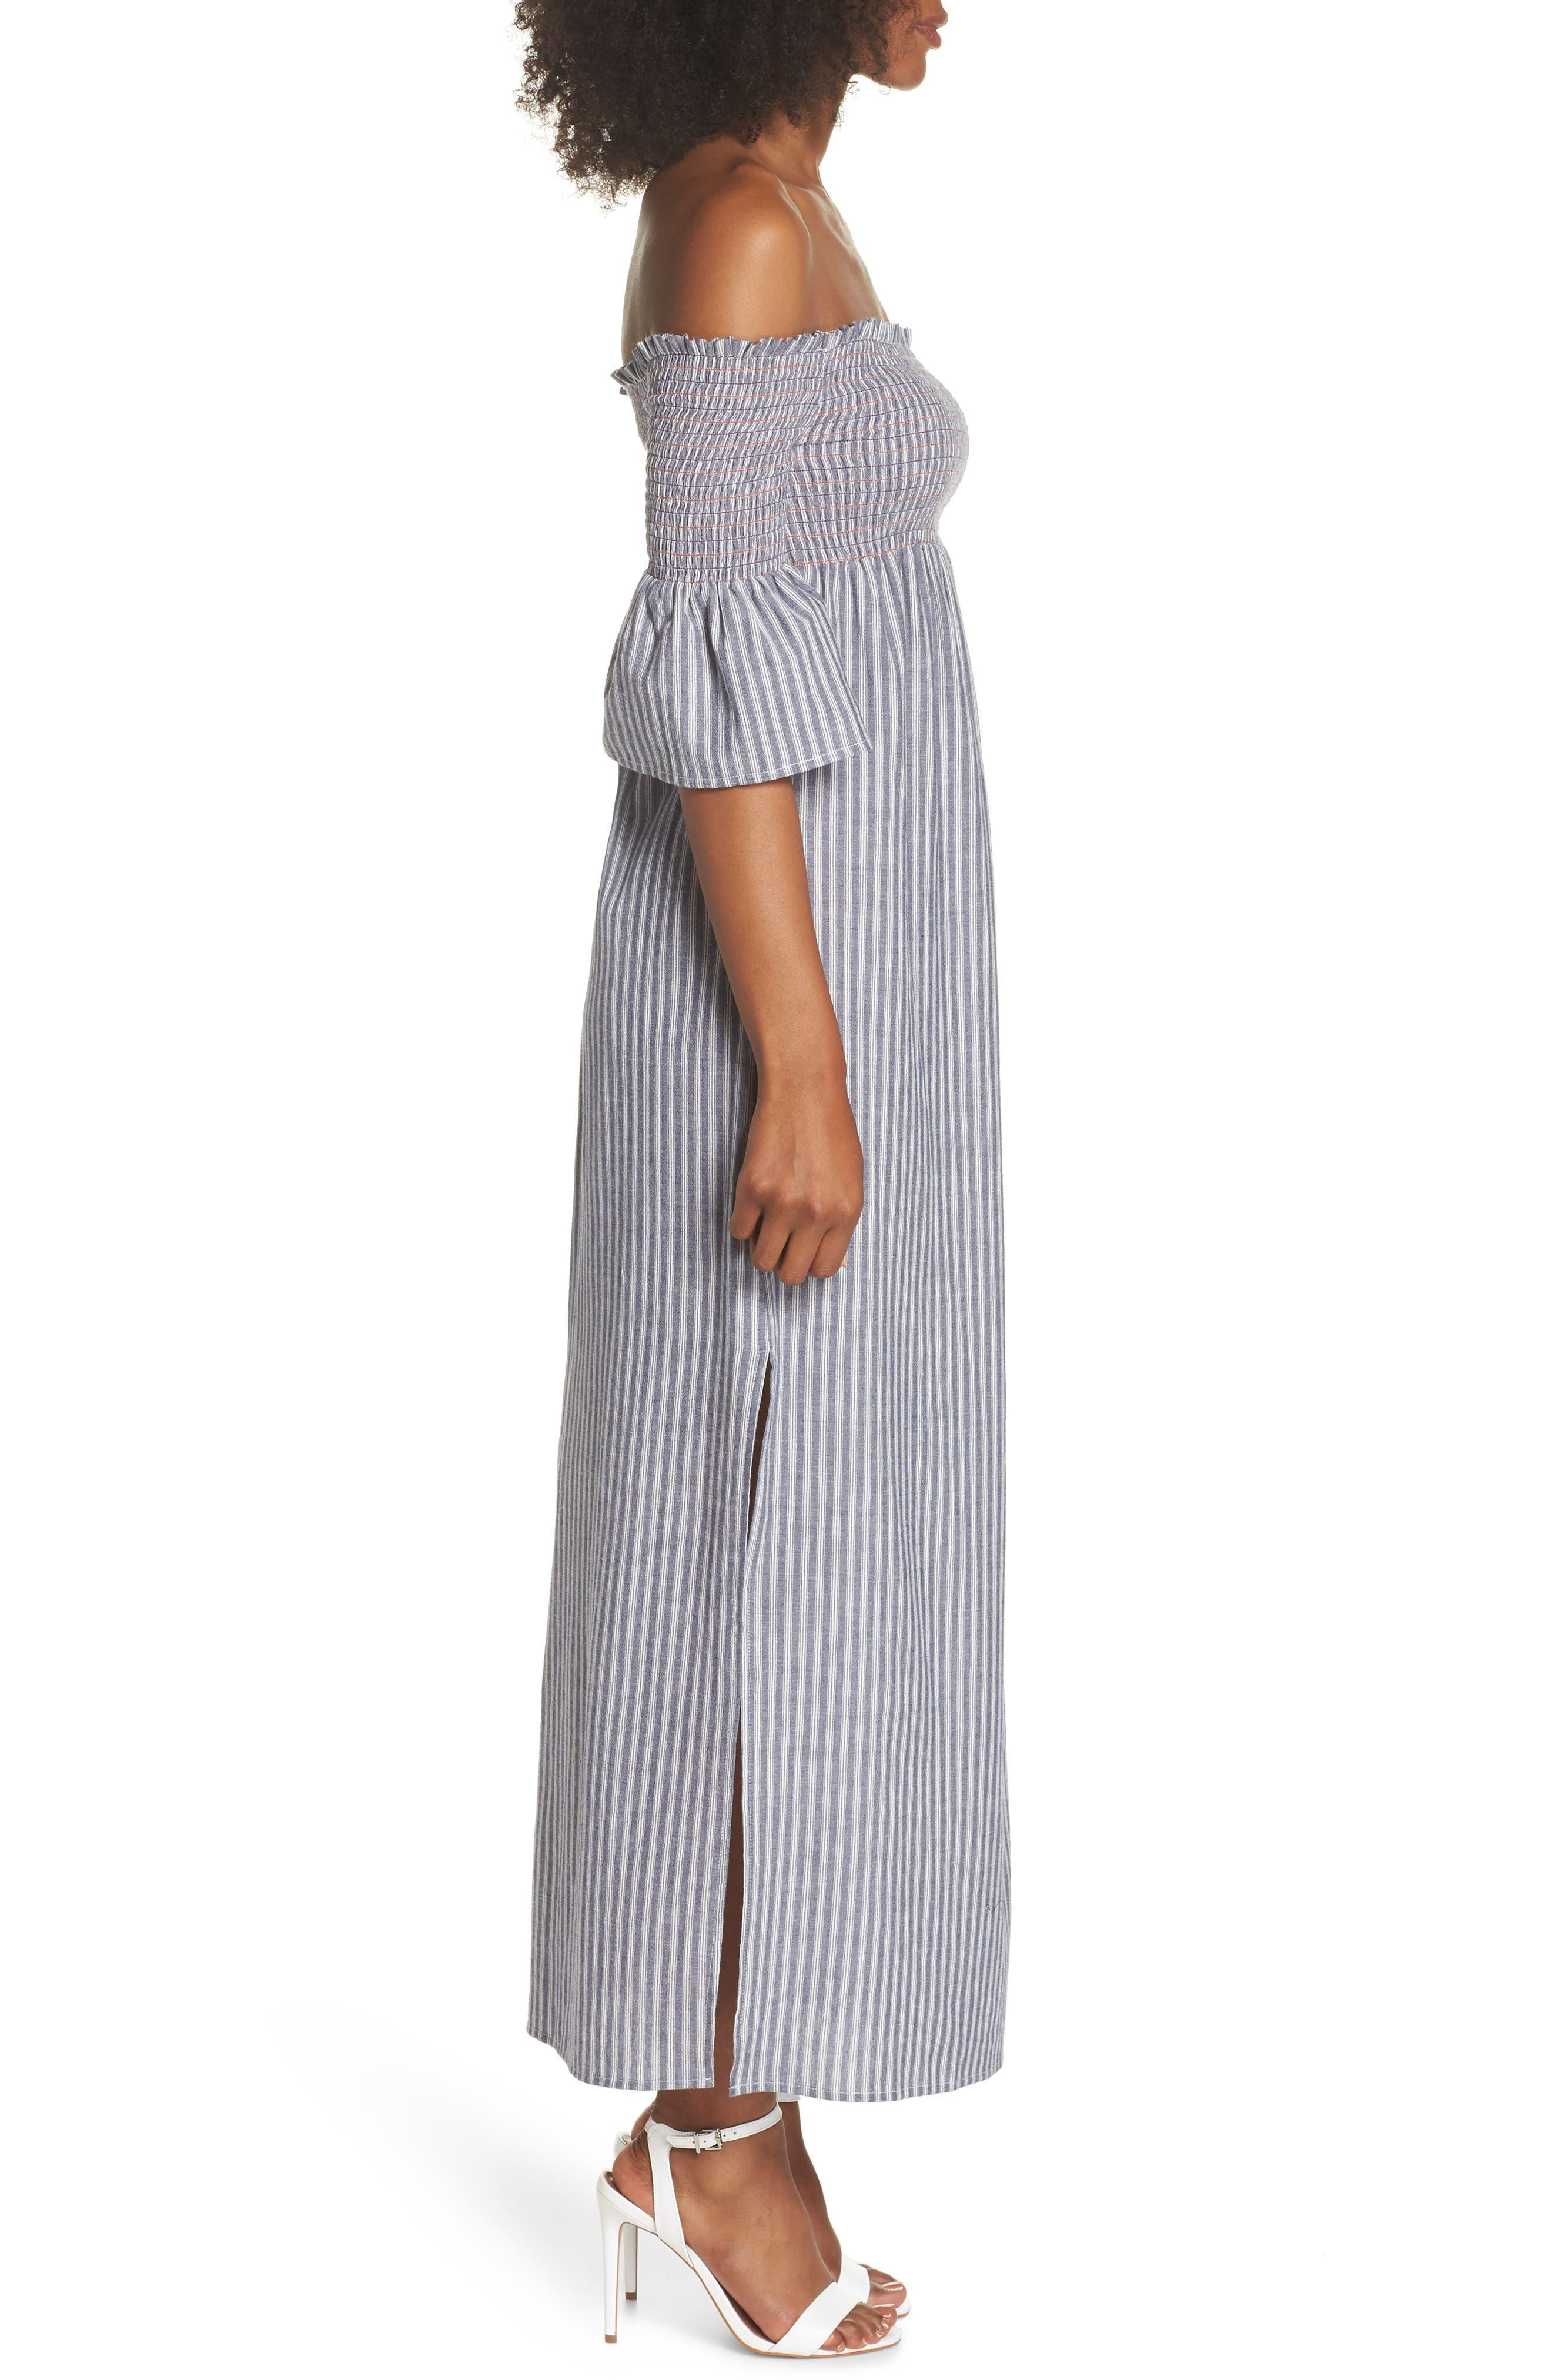 Carmel Smocked Off the Shoulder Maxi Dress,                             Alternate thumbnail 3, color,                             428